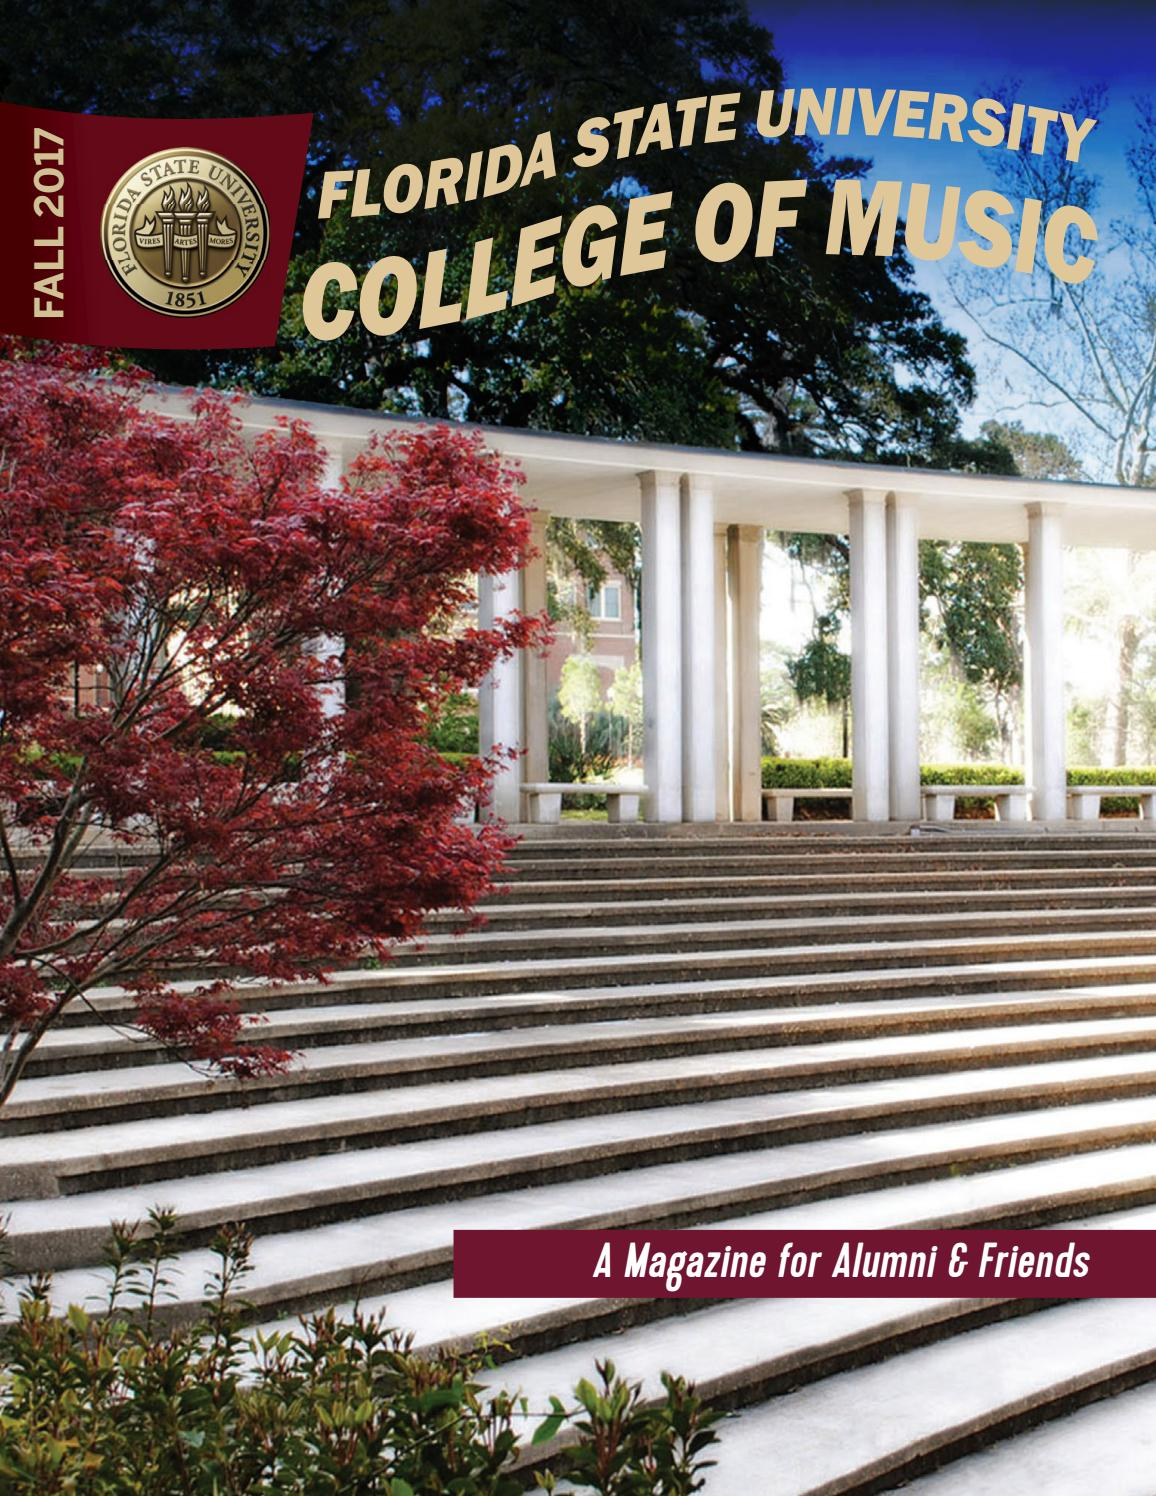 2017 Alumni Magazine by Florida State University College of